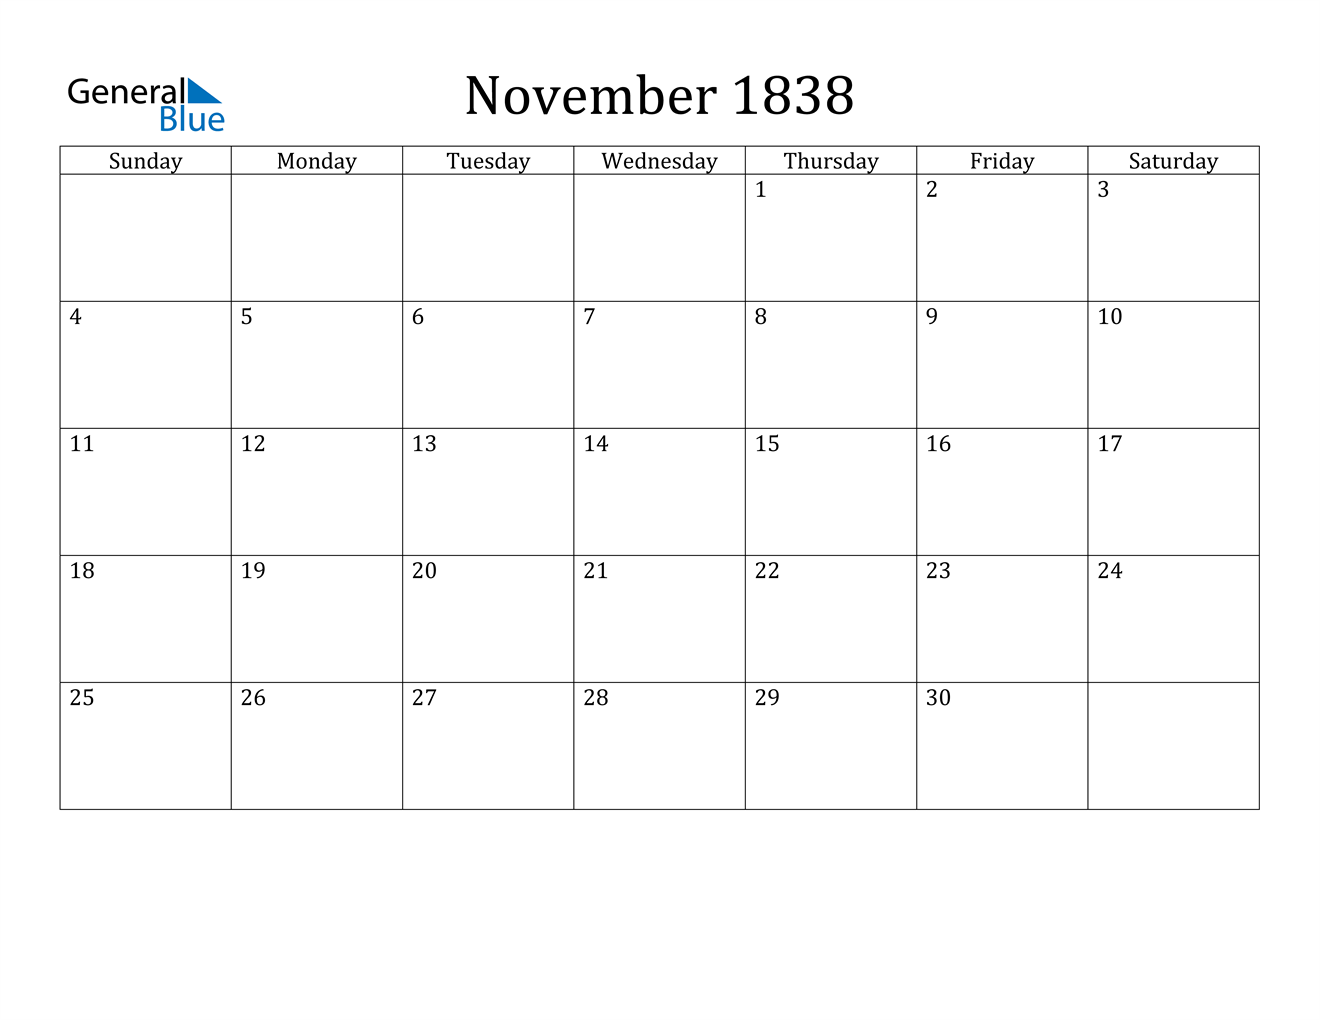 Image of November 1838 Calendar